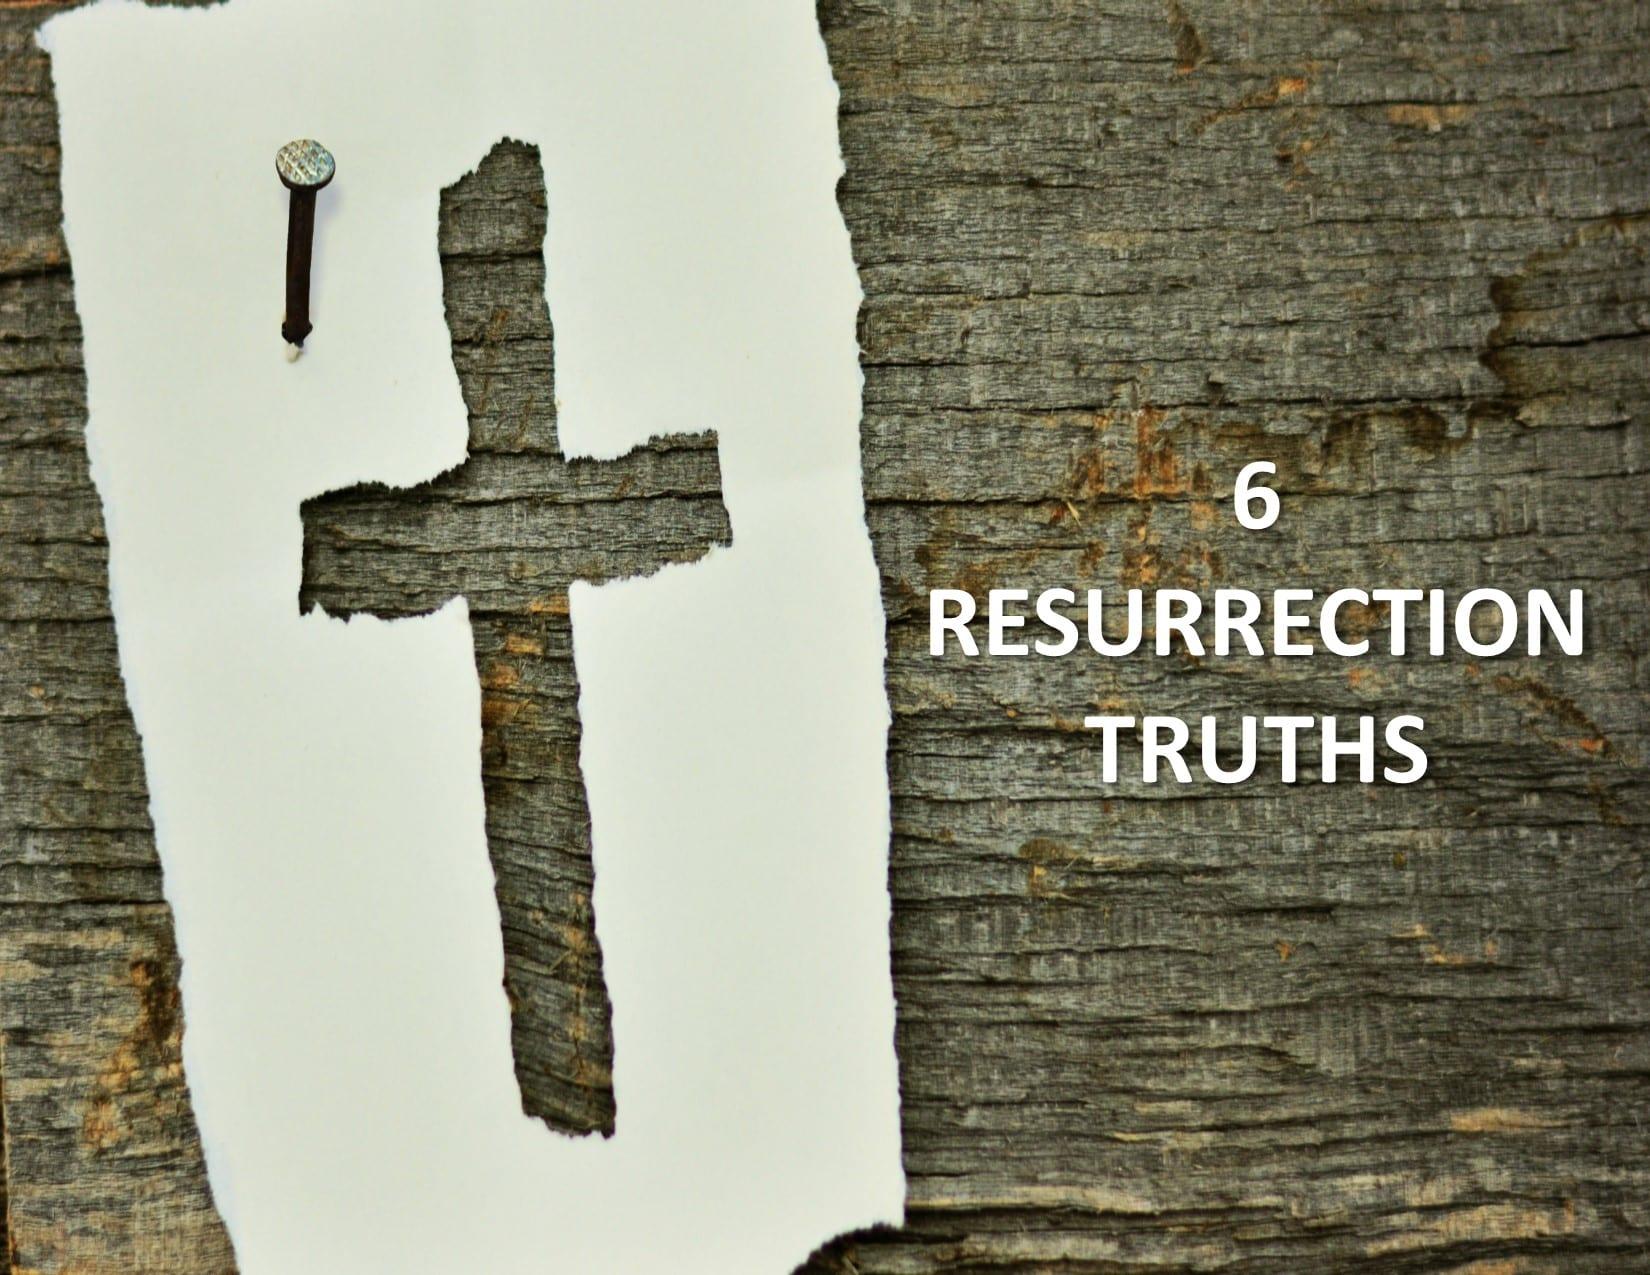 6 Resurrection Truths